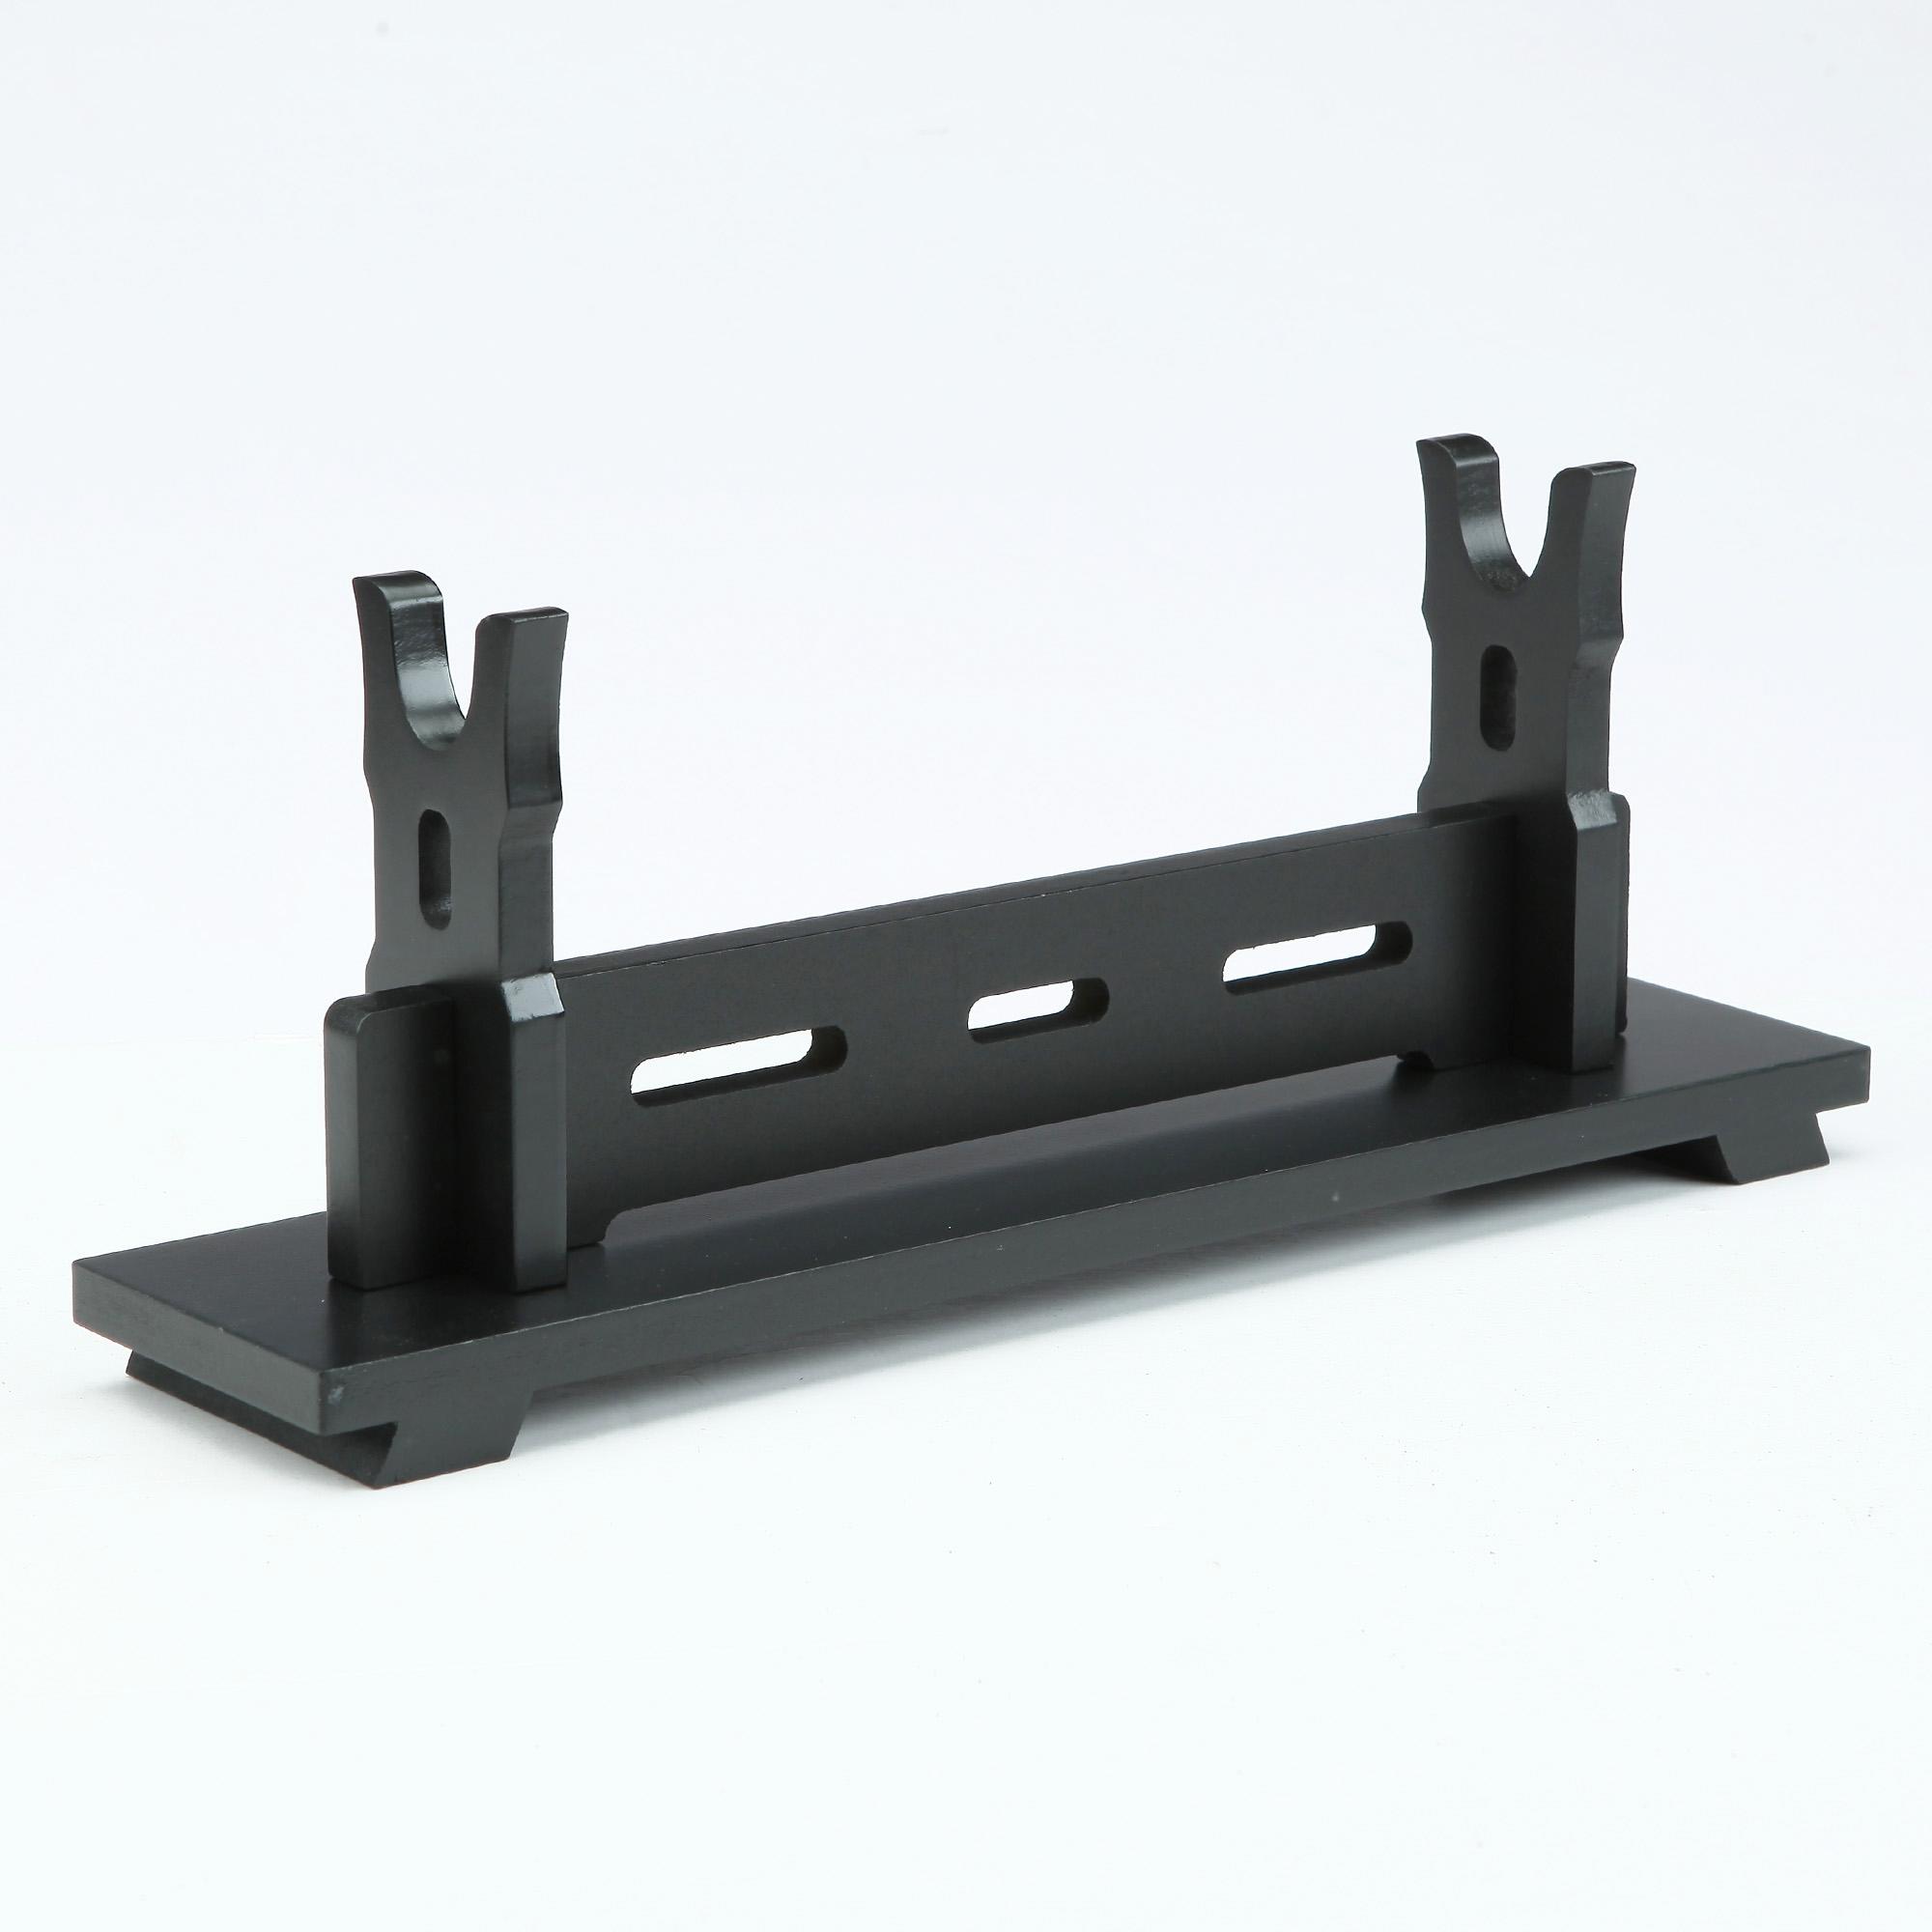 Handmade Black Wooden Single Tier Katana Sword Bracket Stand Holder Display Rack Stand